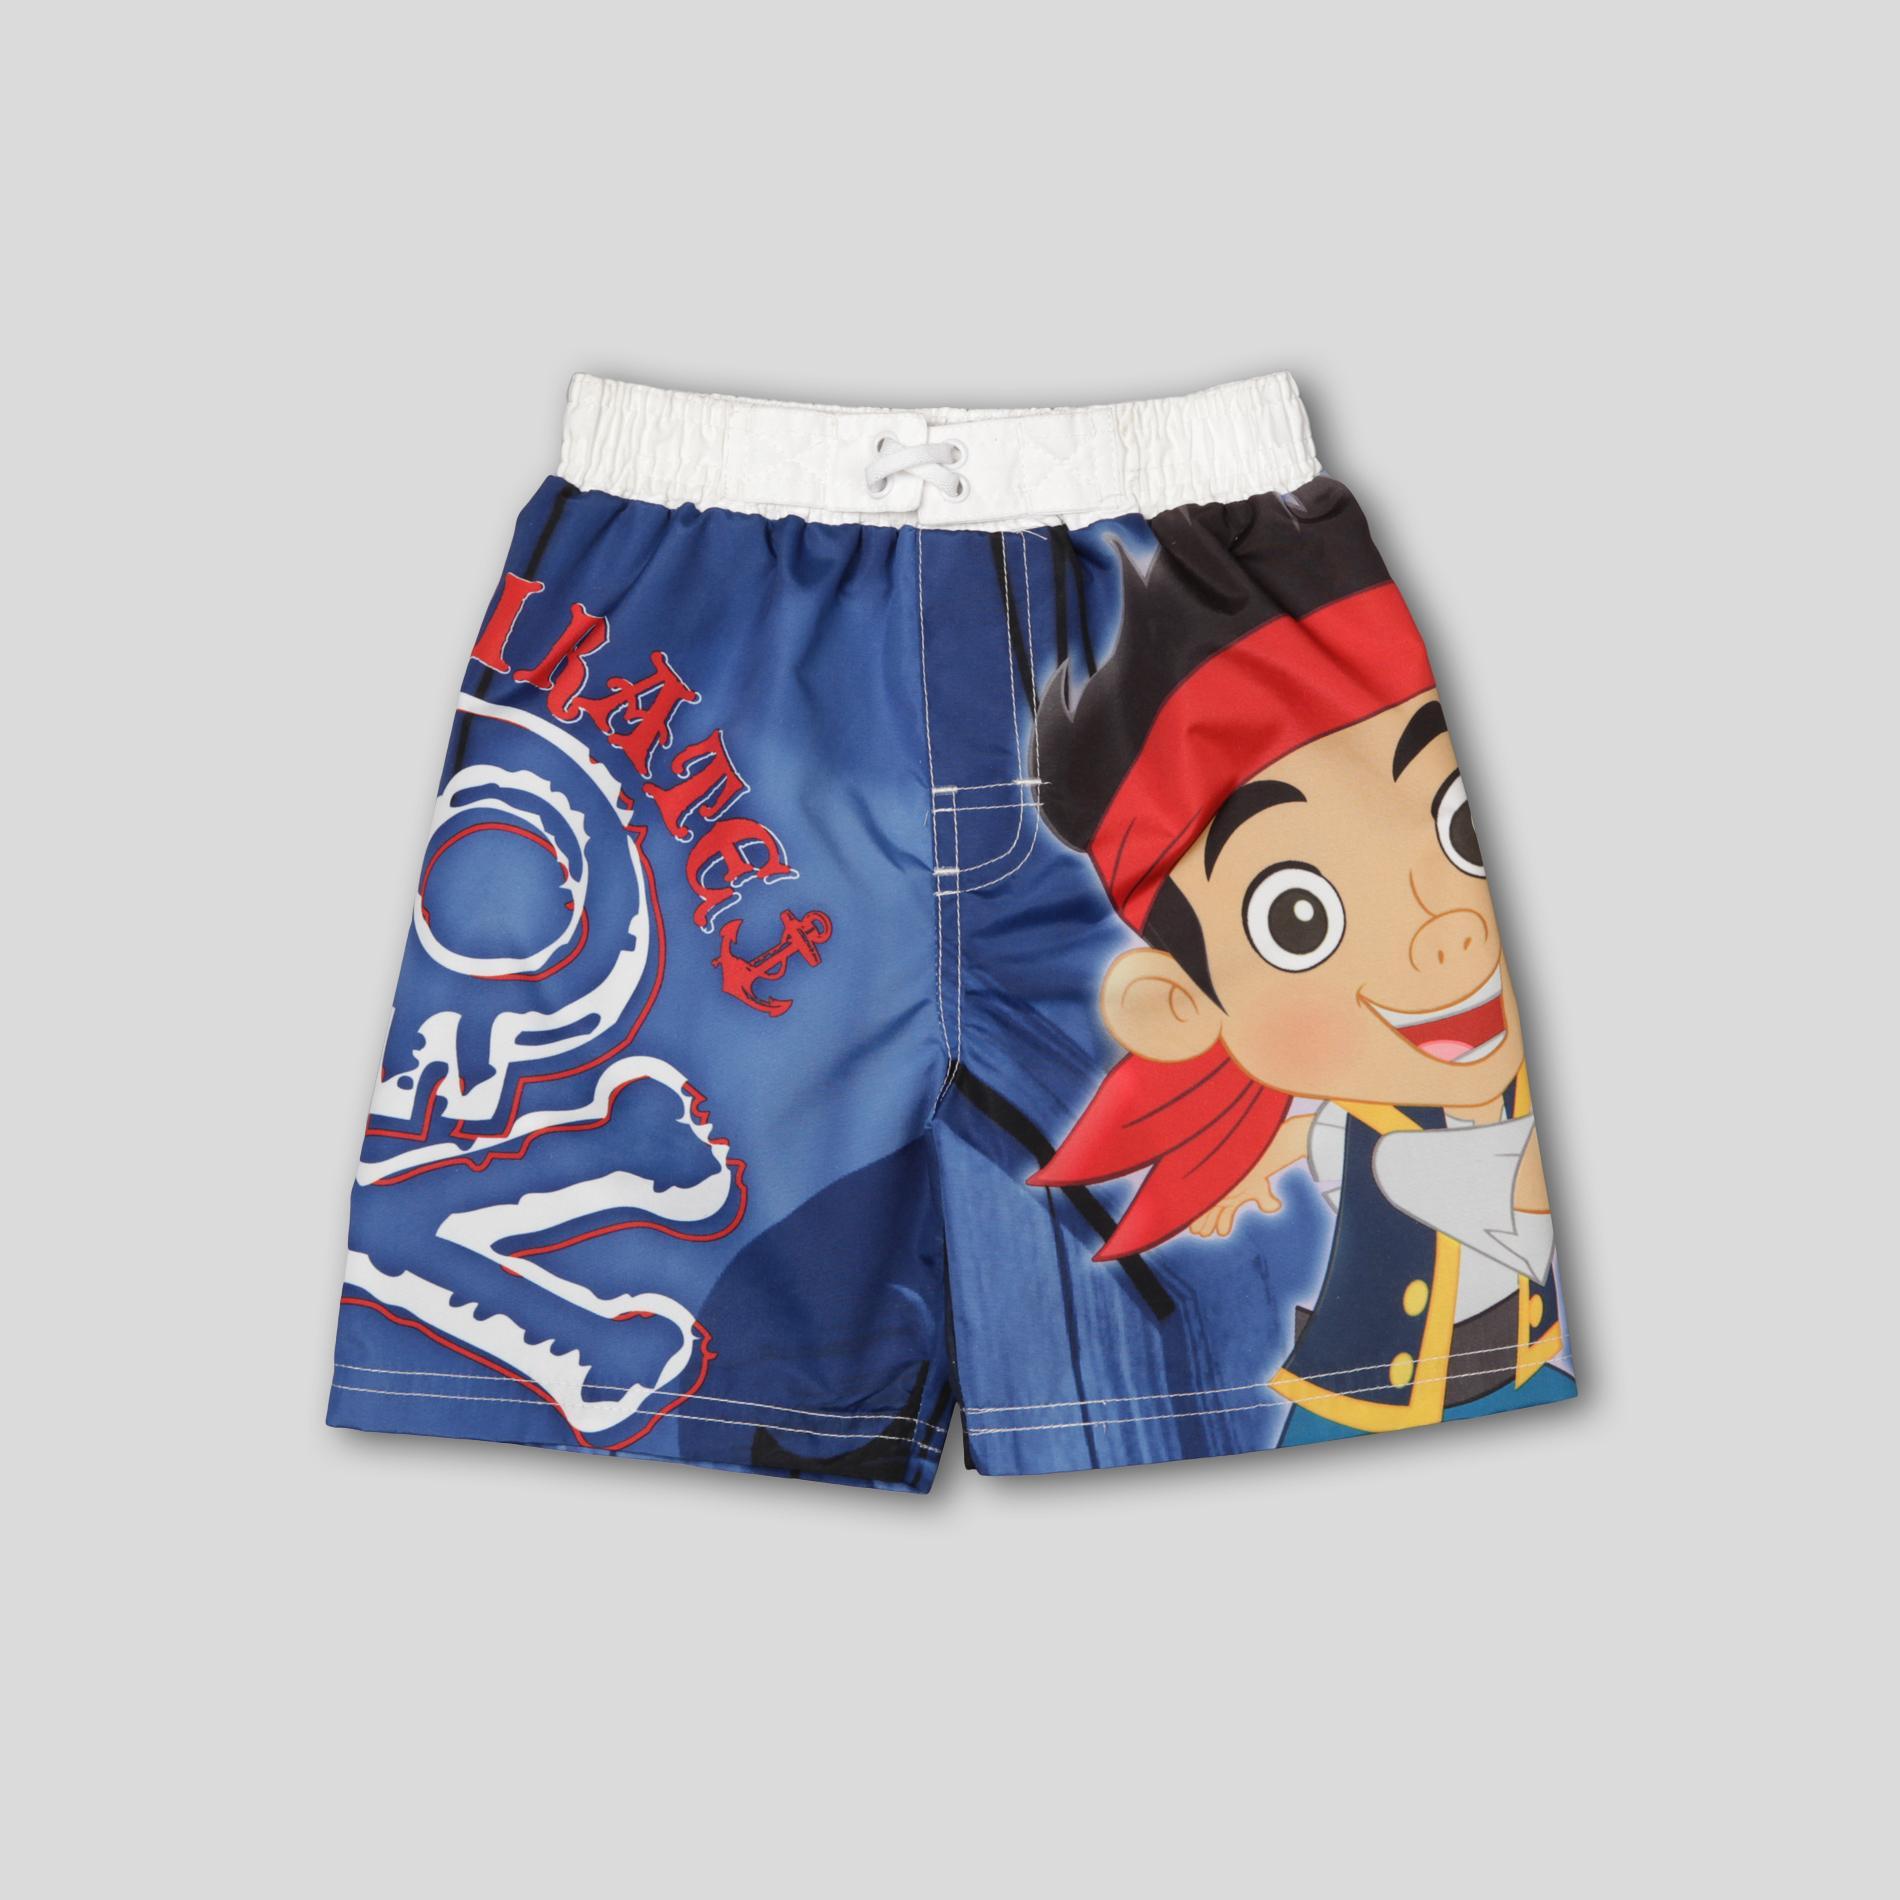 f94bf7fefd5ef Disney Jake & the Never Land Pirates Infant & Toddler Boy's Swim Shorts